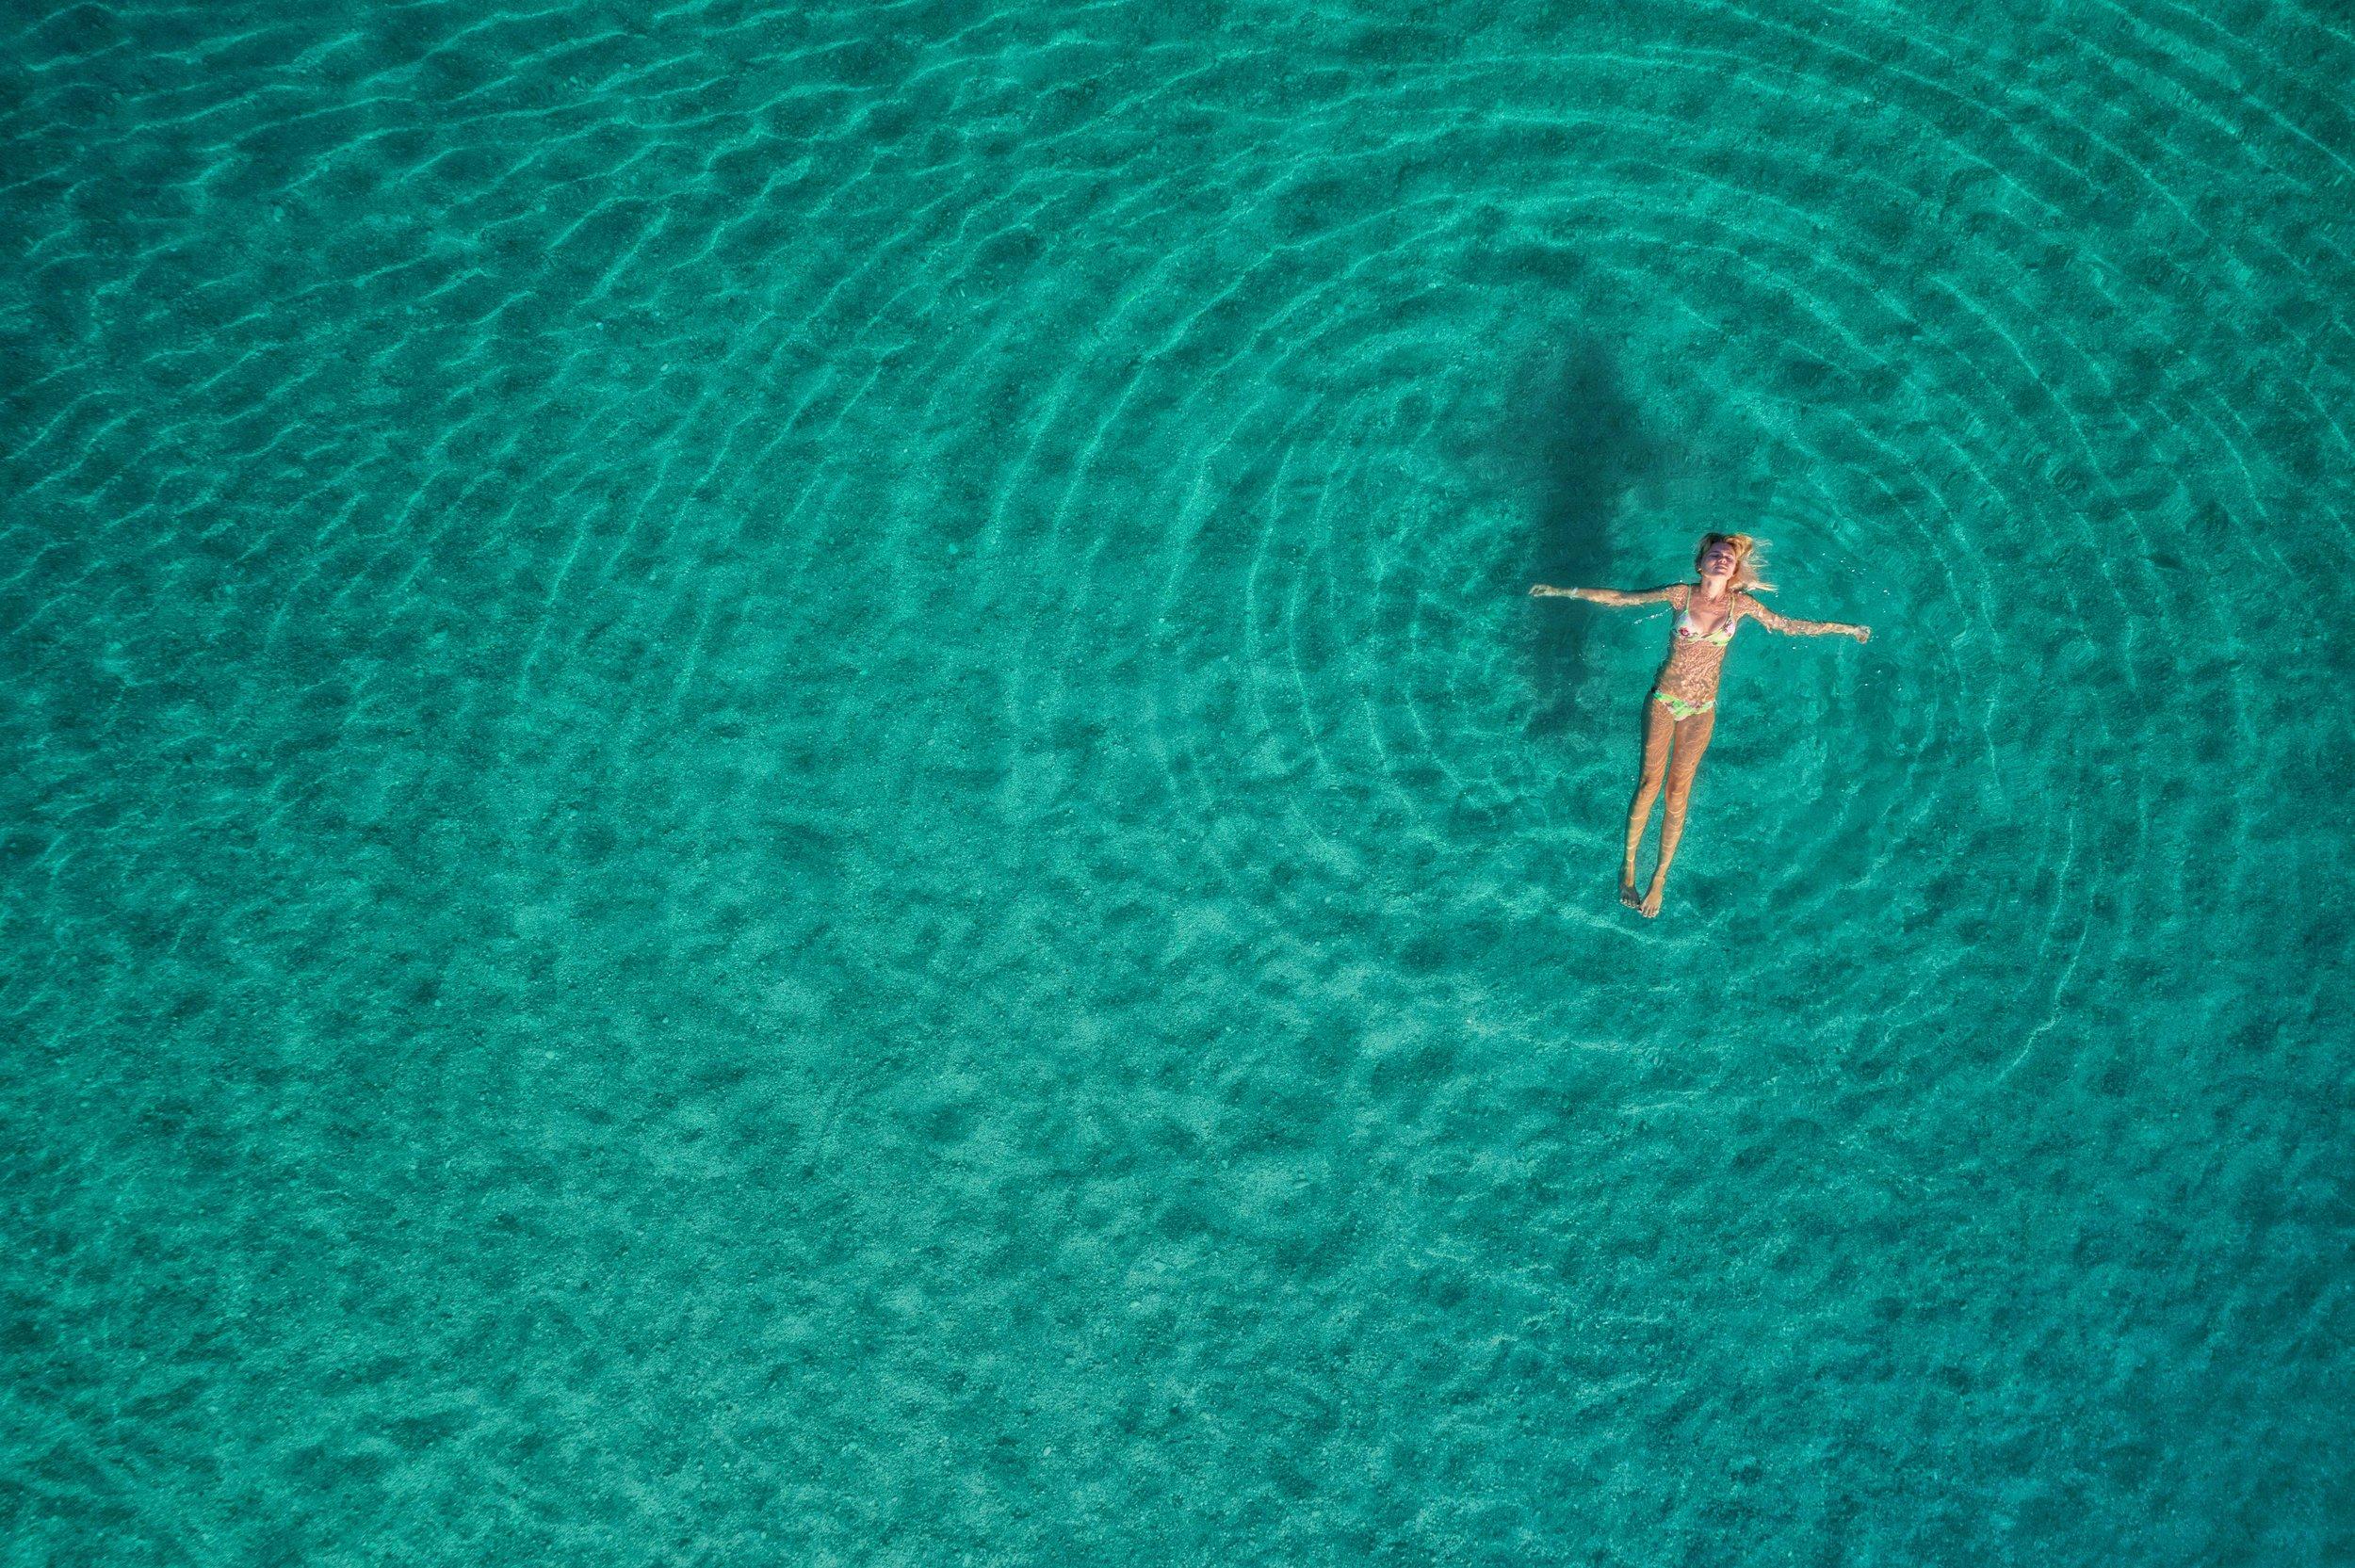 aerial-view-of-swimming-woman-in-mediterranean-PBK6ZLG.jpg